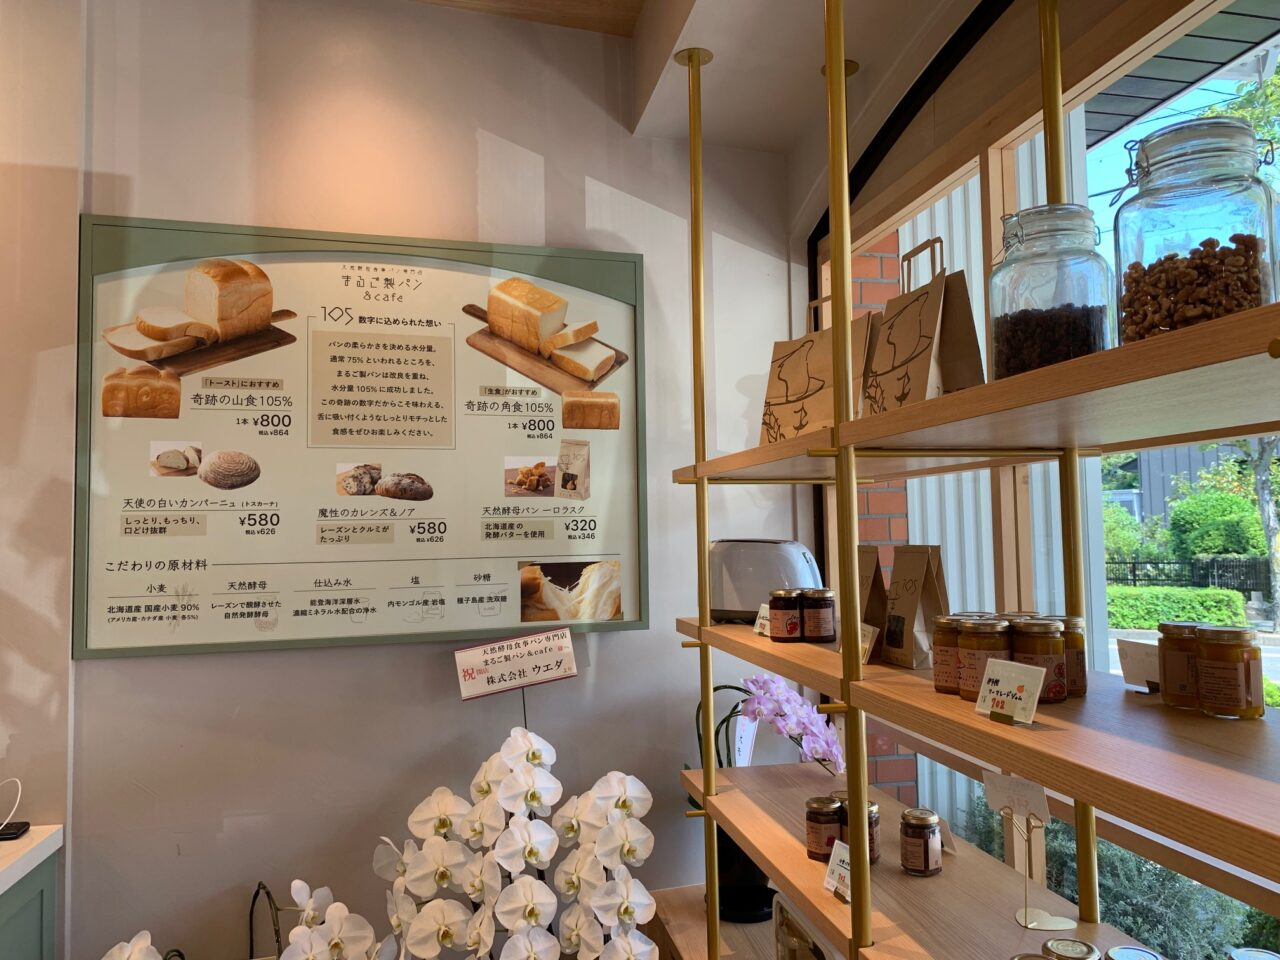 nagoya-marugo-bread-cafe